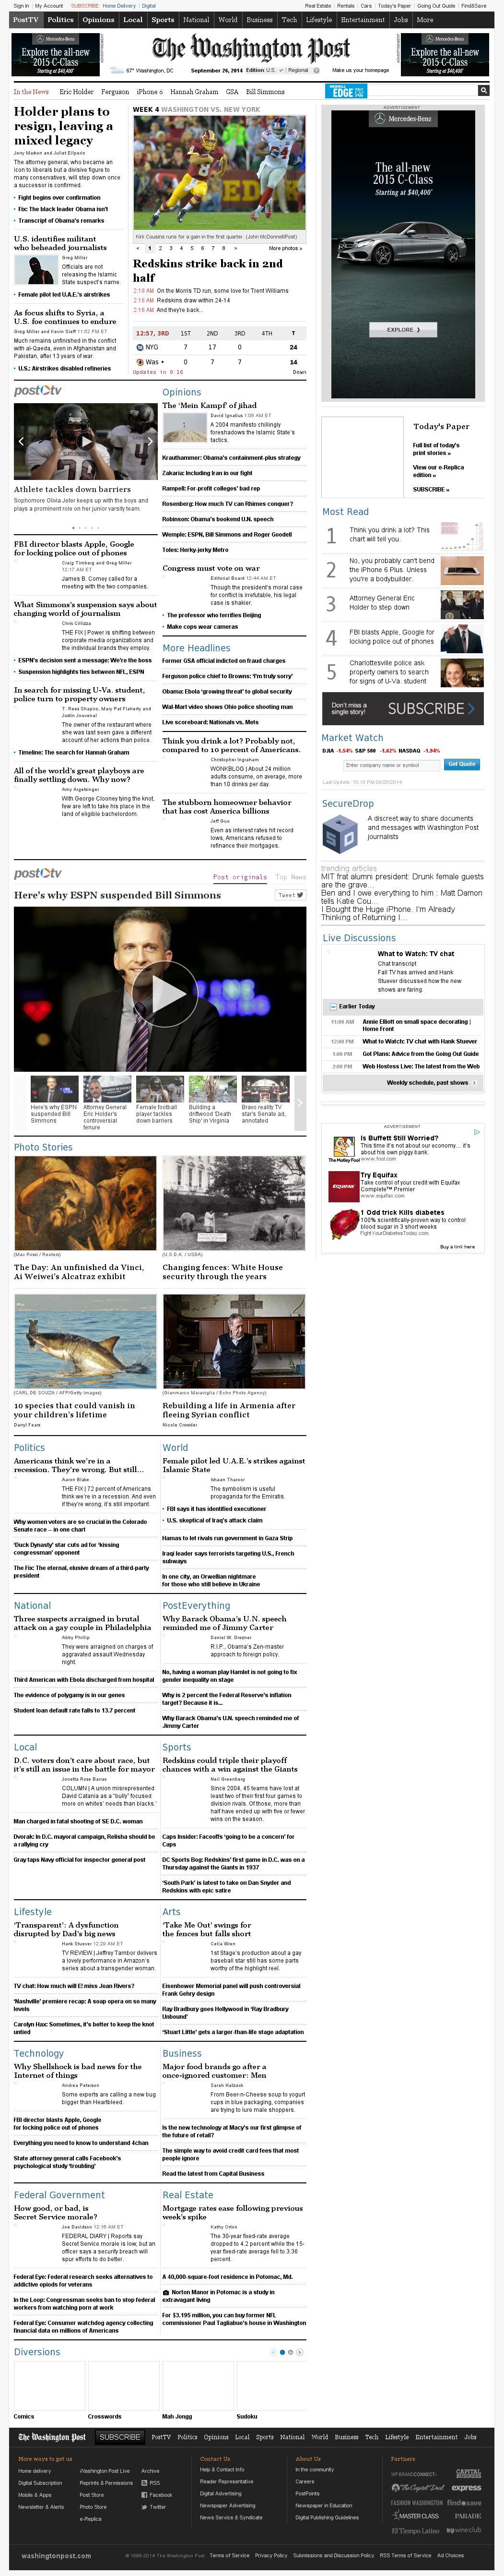 The Washington Post at Friday Sept. 26, 2014, 2:26 a.m. UTC